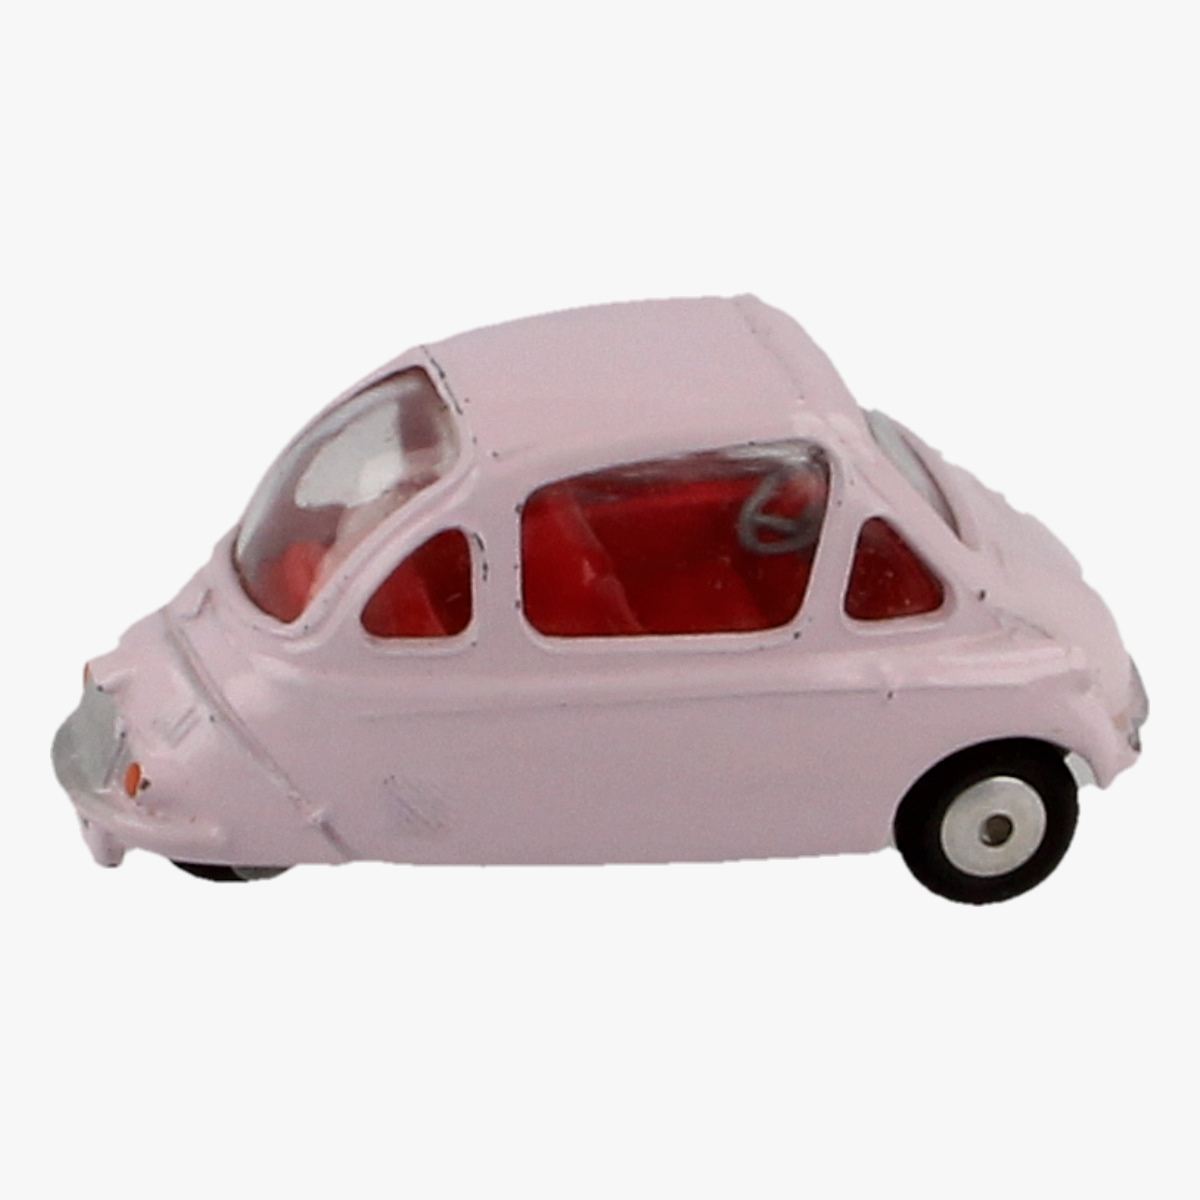 Afbeeldingen van Corgi Toys. Heinkel I Economy Car. Nr. 233